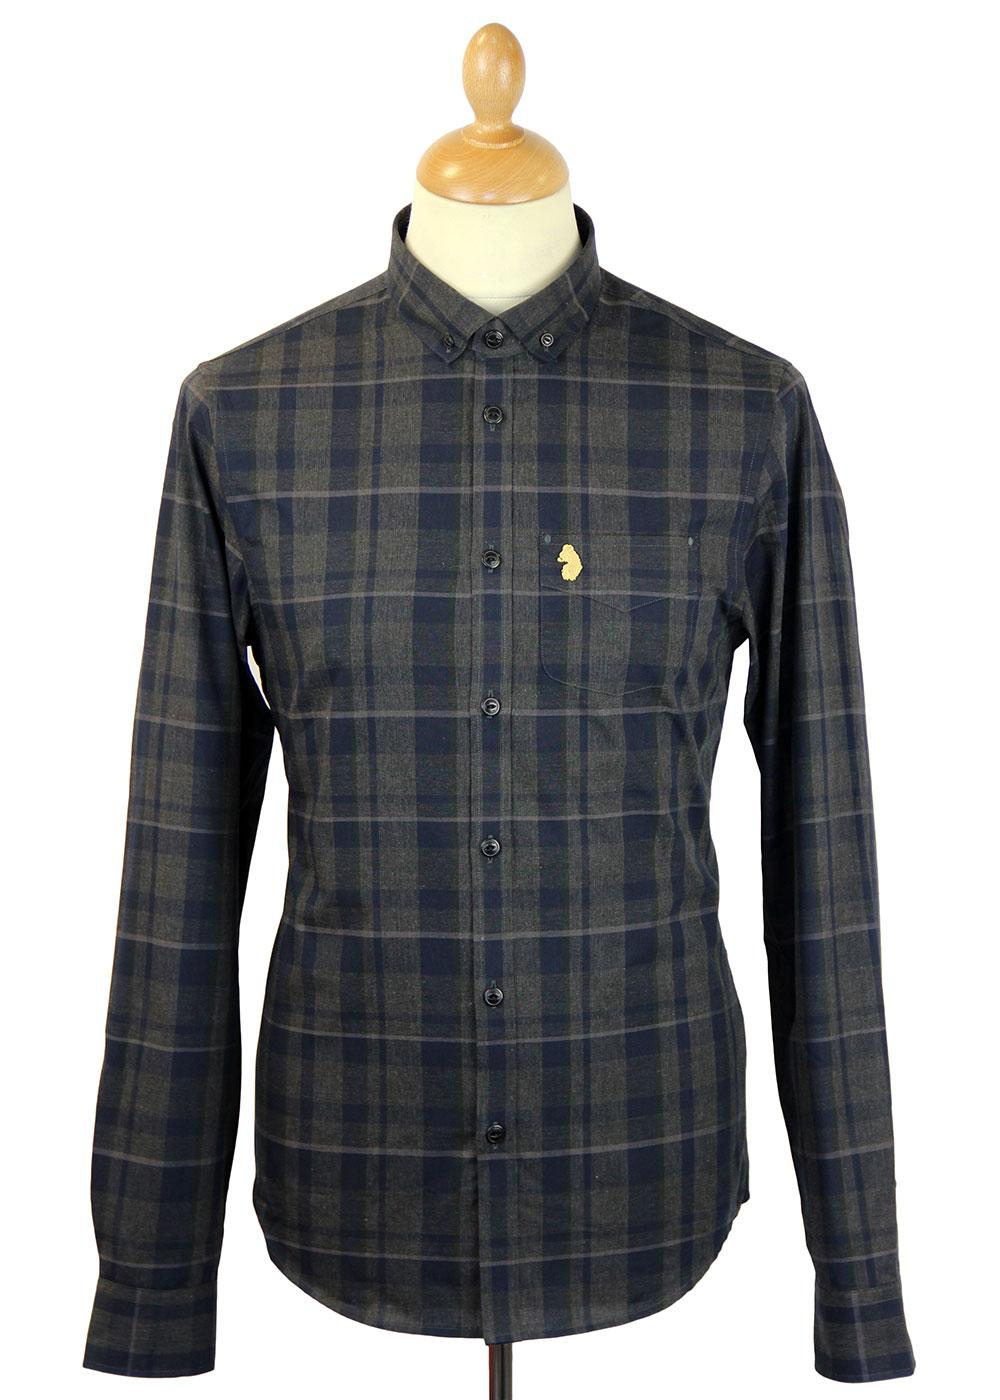 Slashers LUKE DENIM Mod Button Down Check Shirt CM